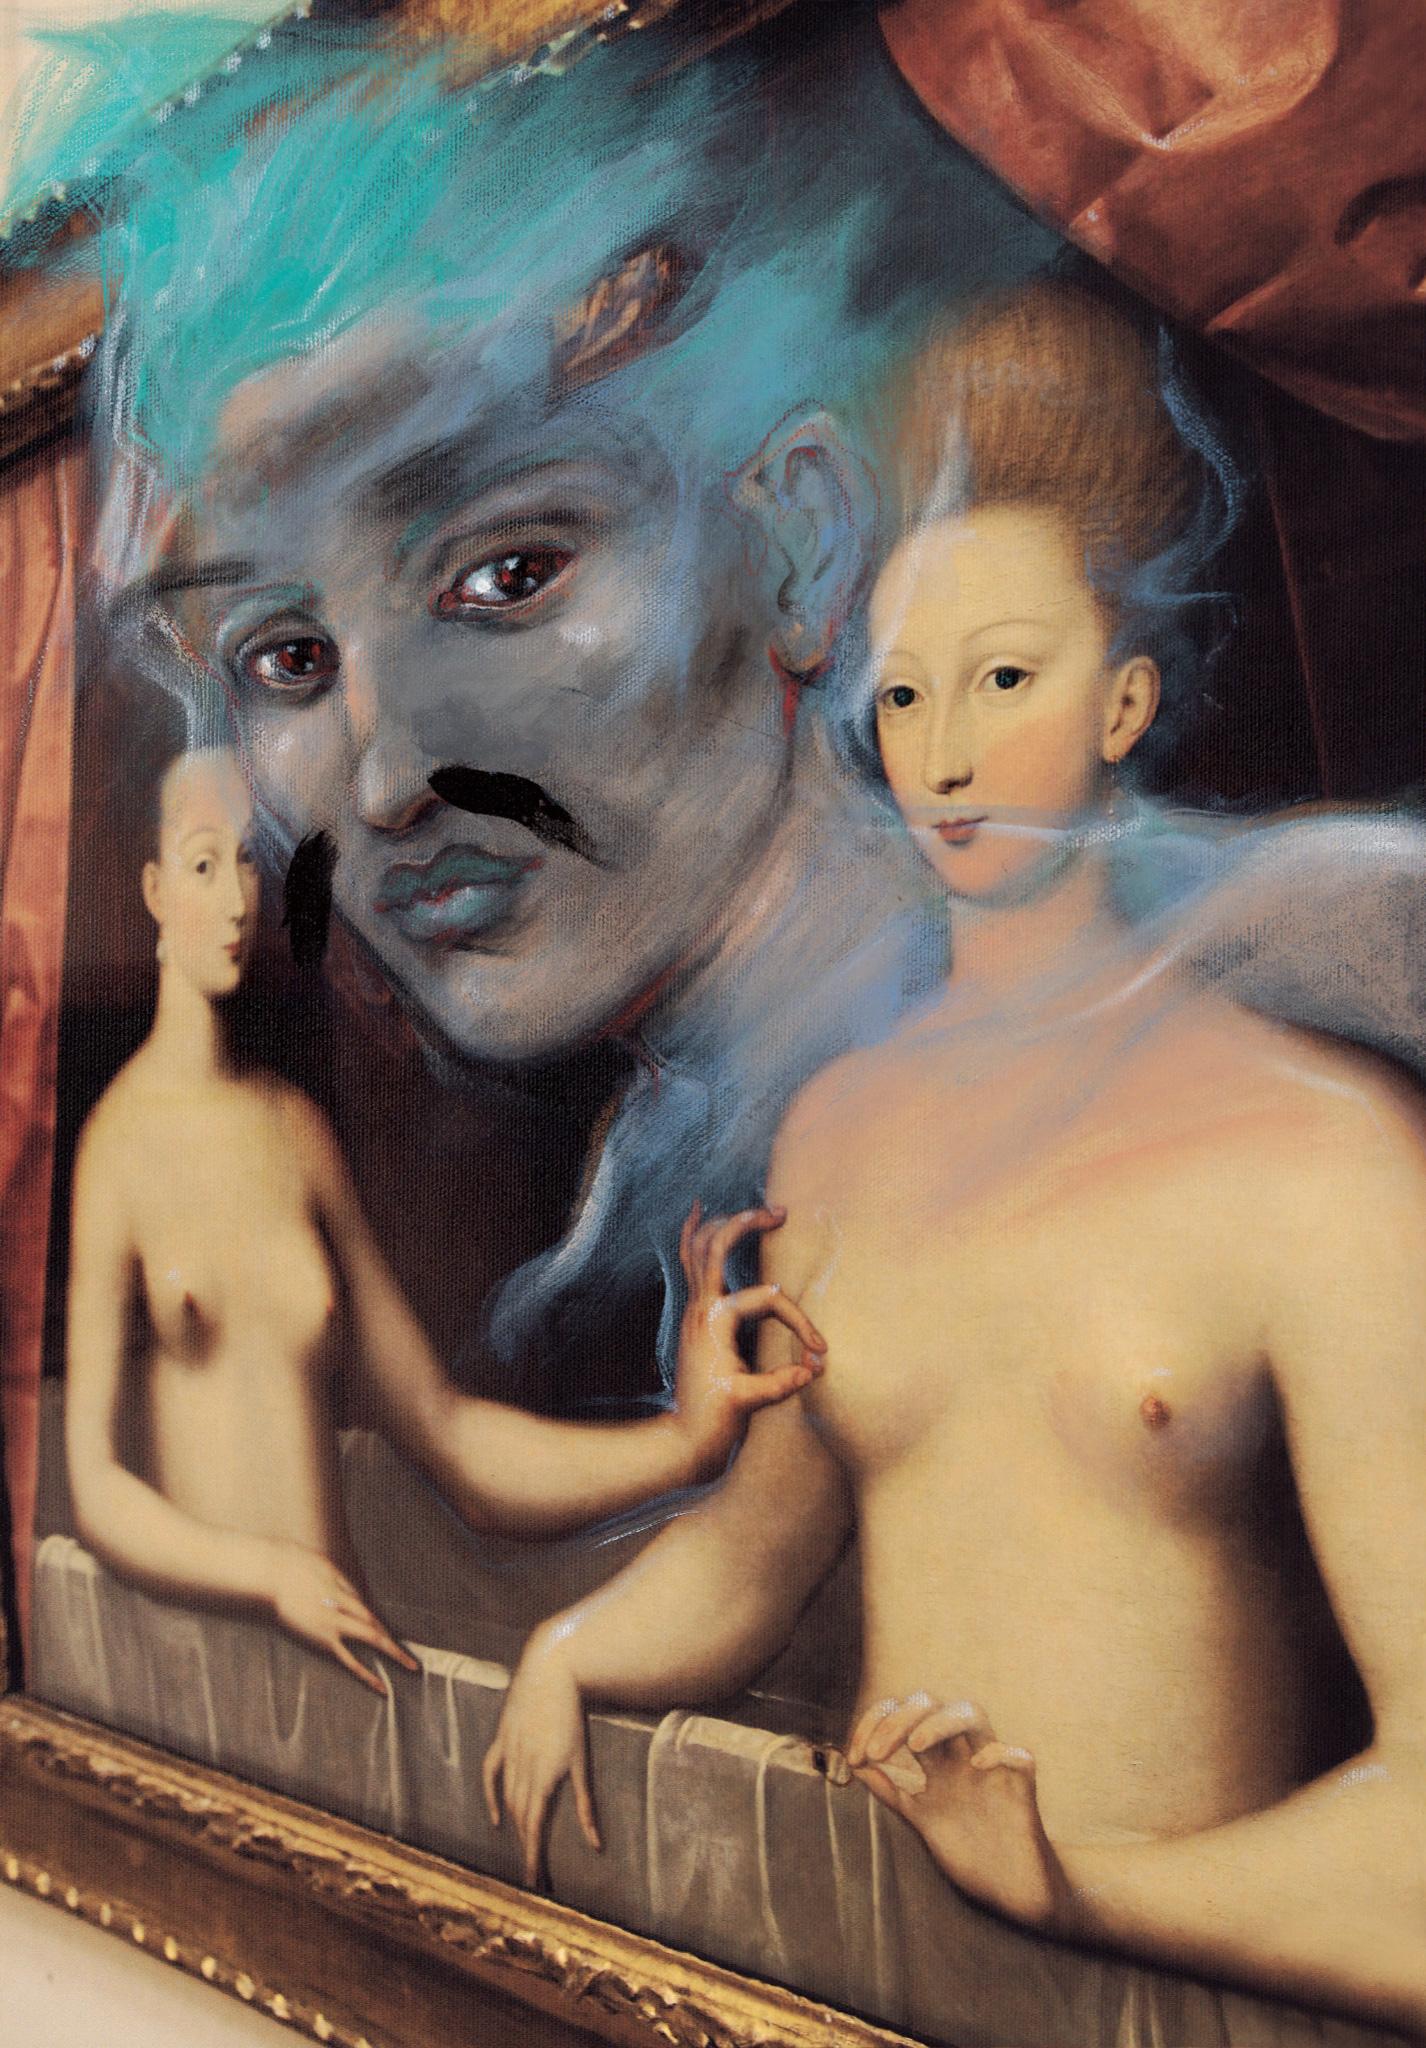 Bilal-fantomes-louvre-22.jpg